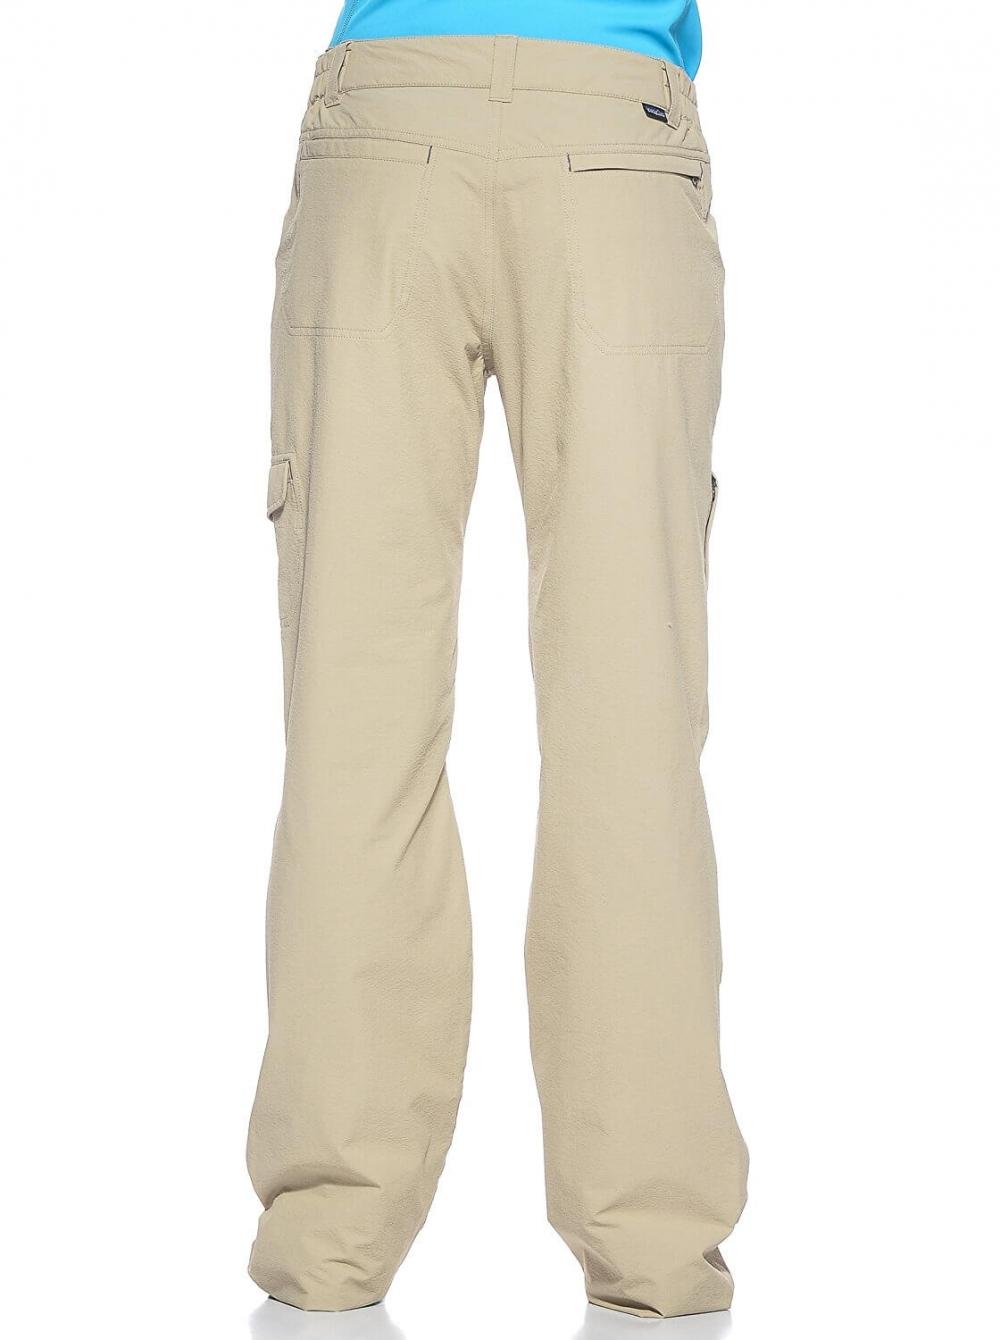 Штаны PATAGONIA nomader pants lady (размер 6-S/M) - 2